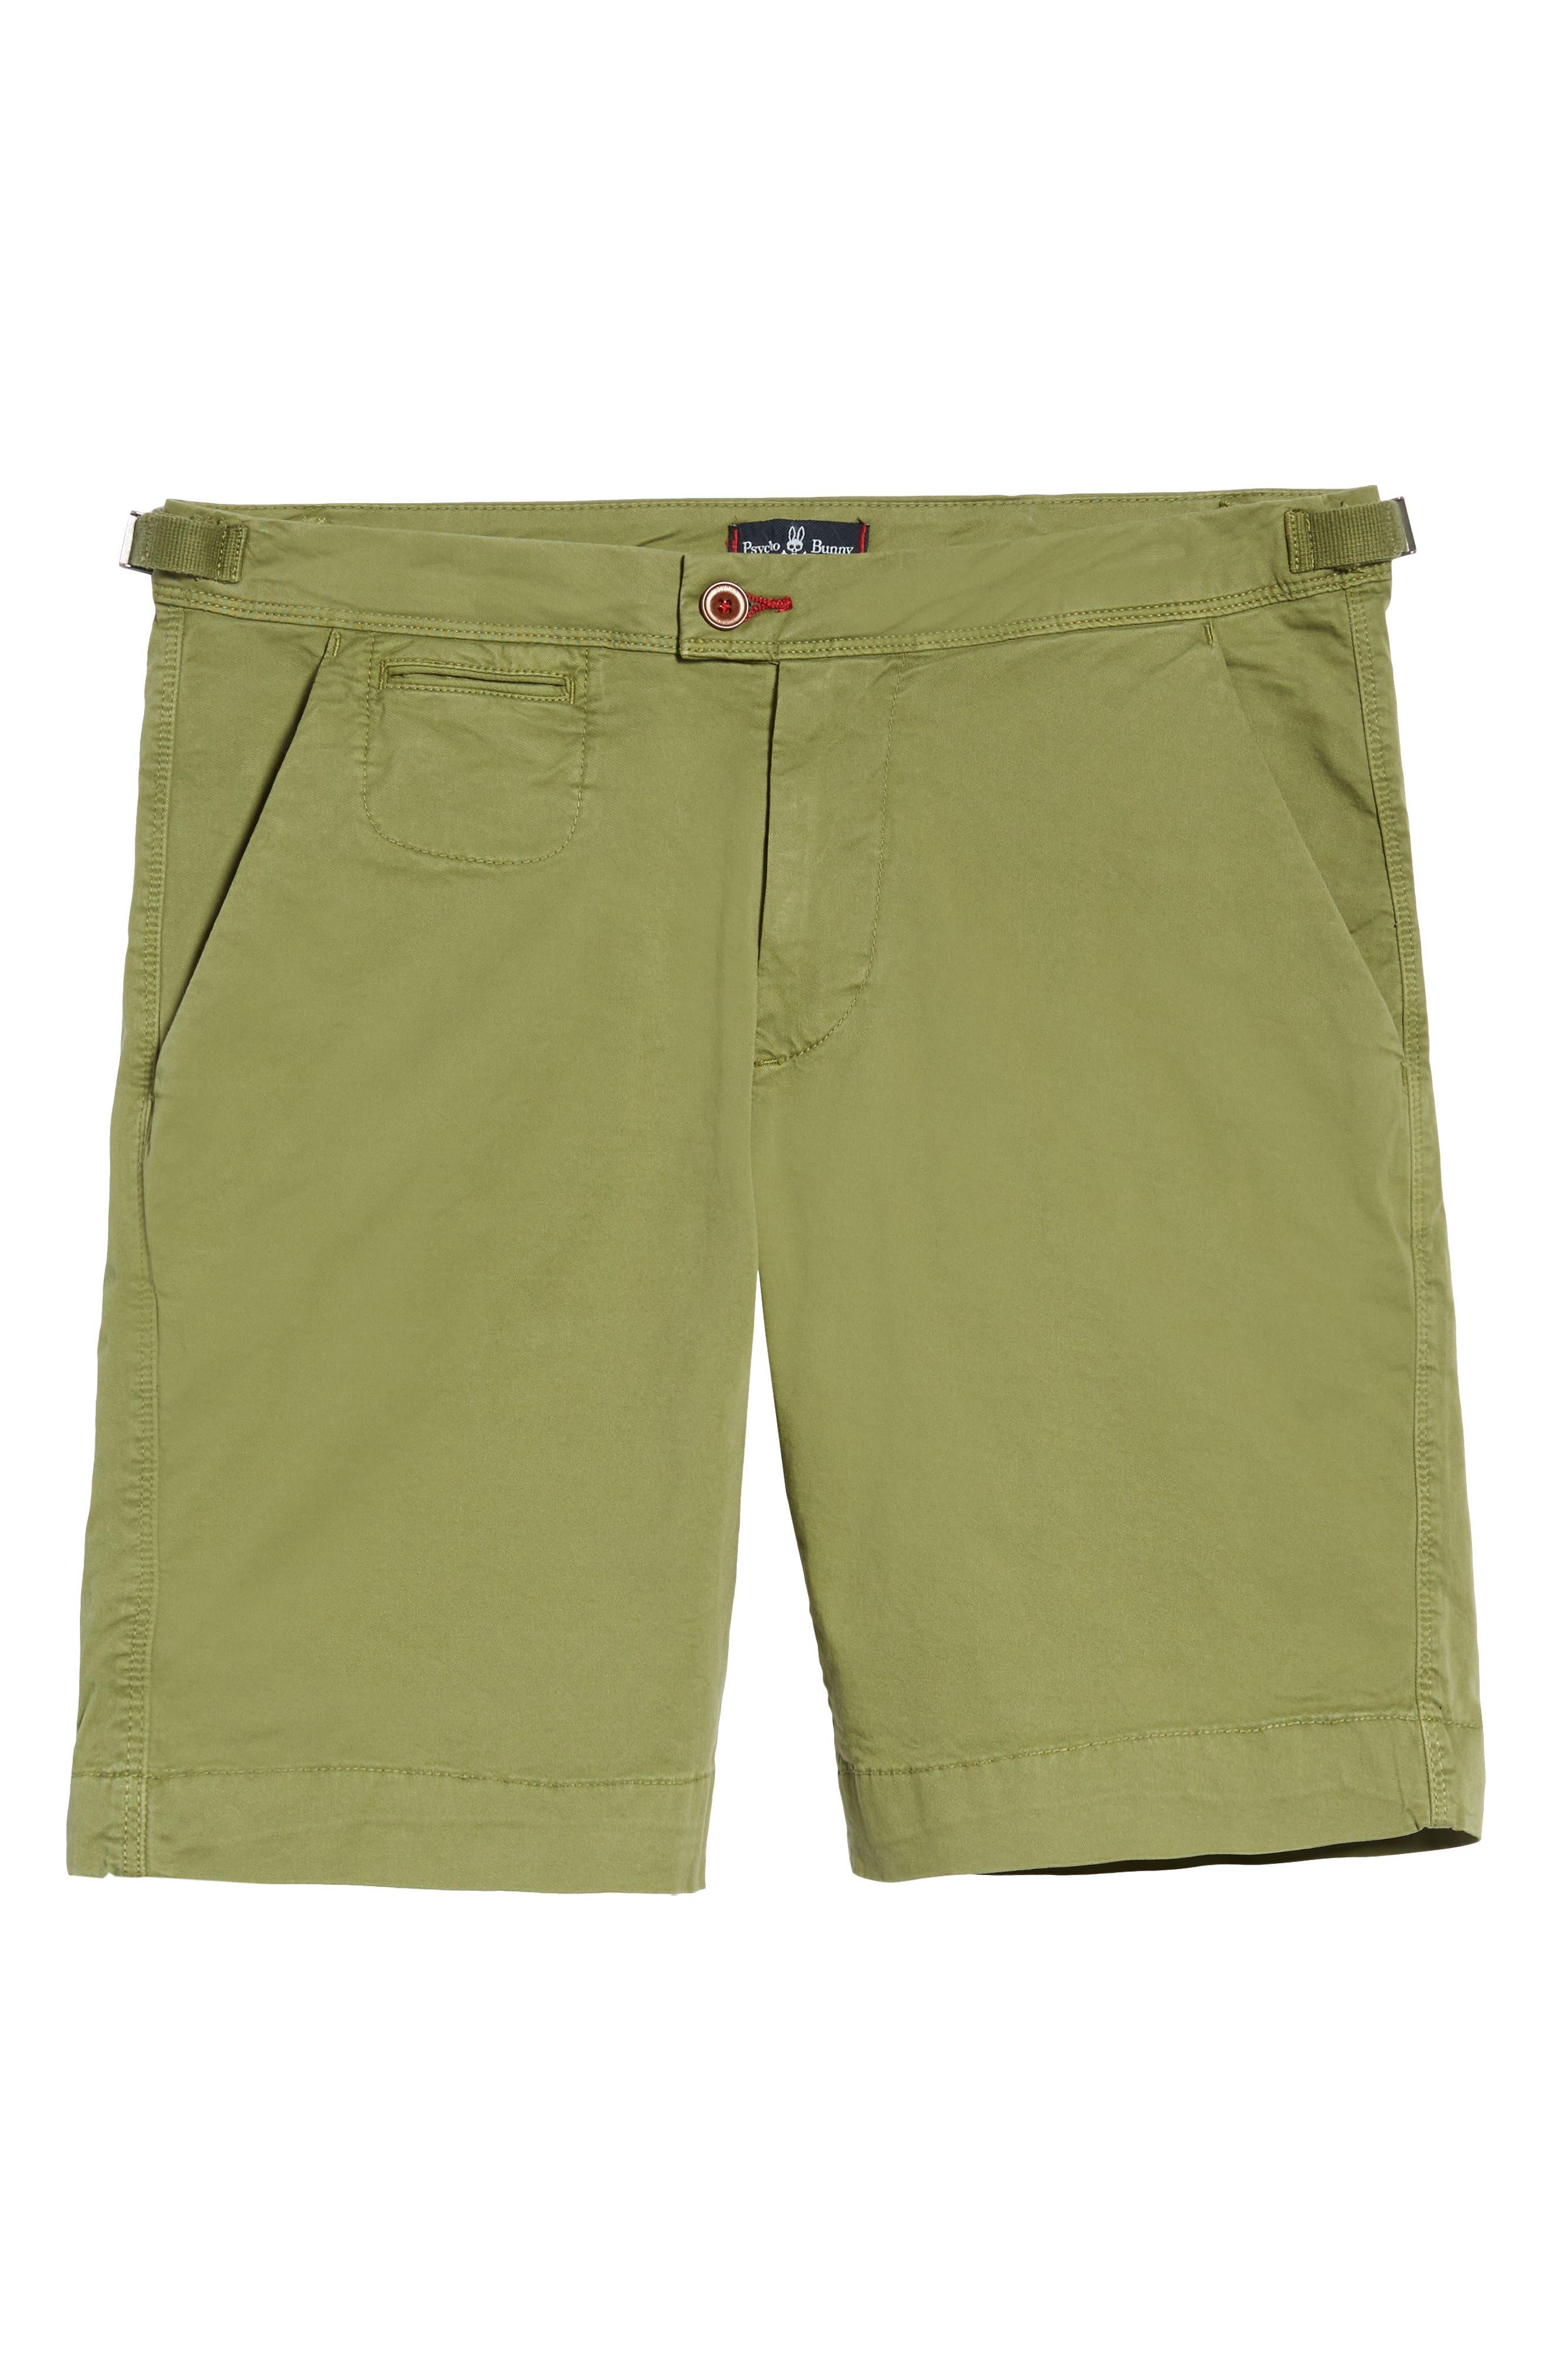 Triumph Shorts,                             Alternate thumbnail 6, color,                             OLIVINE